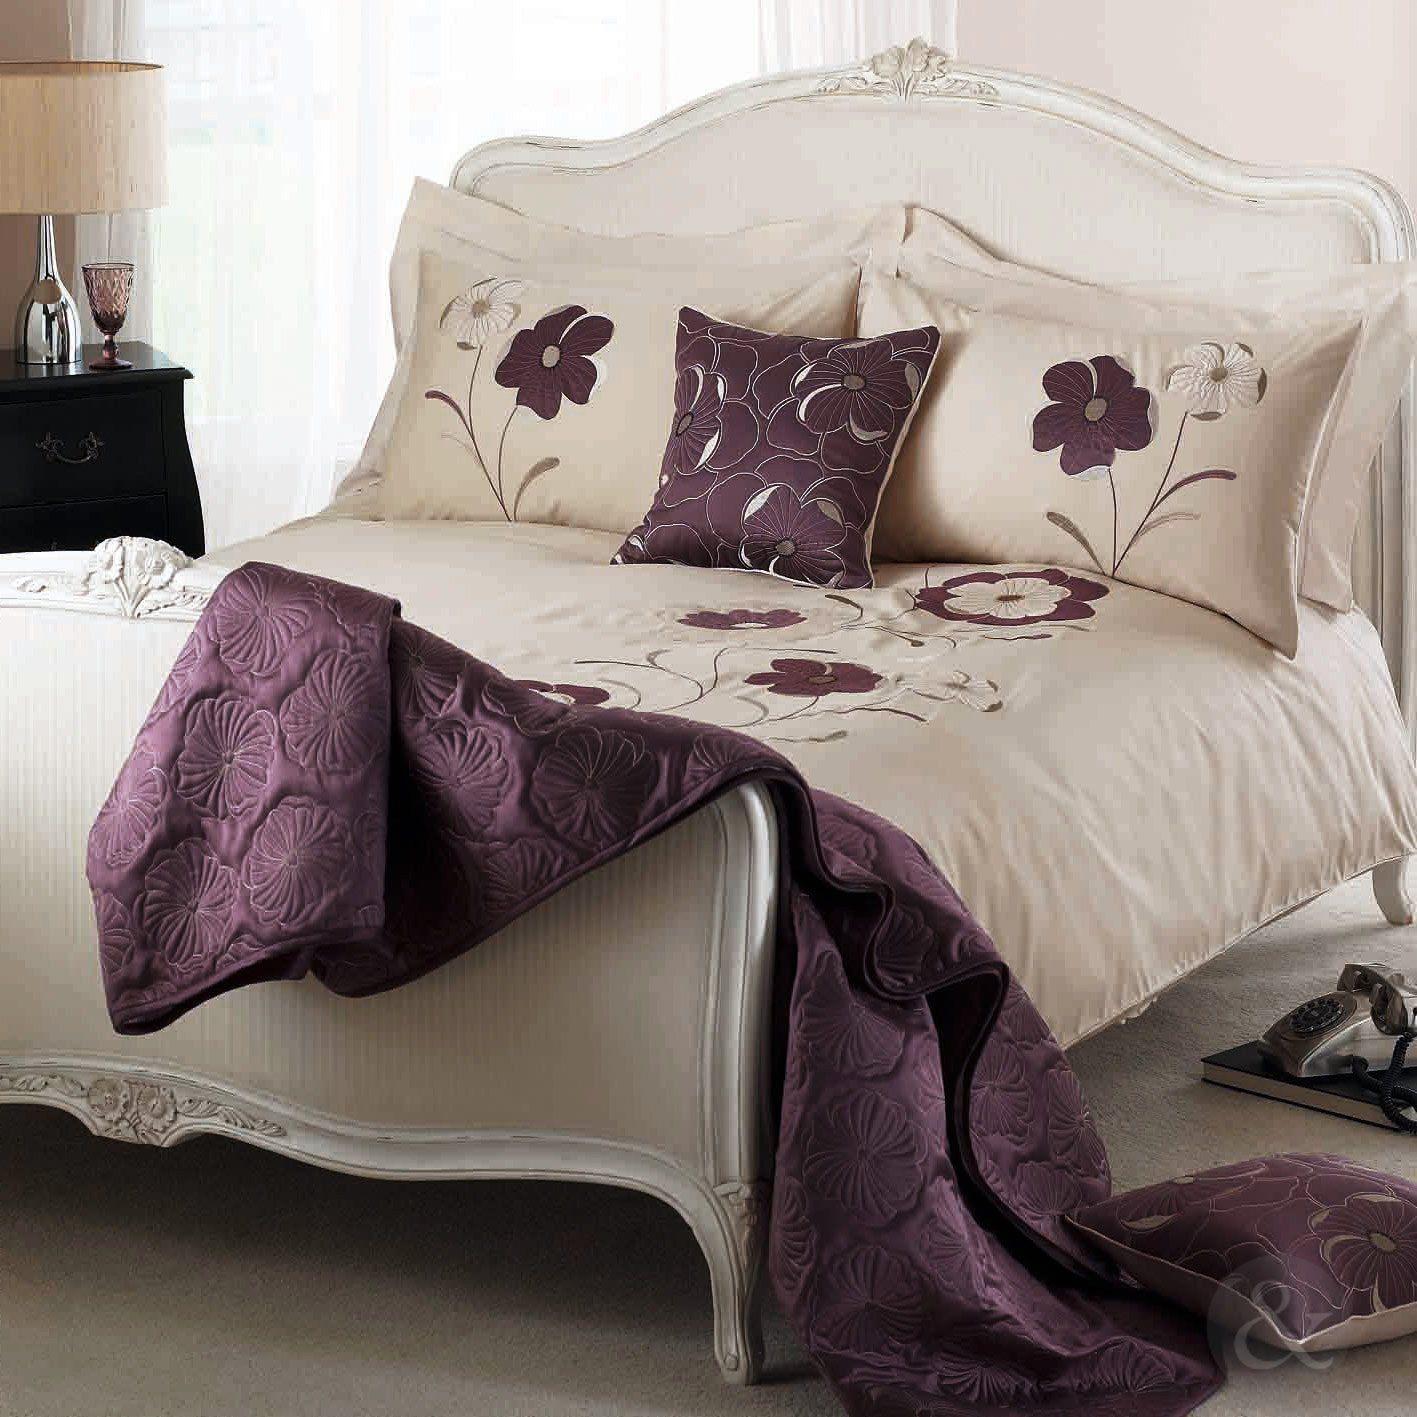 Purple And Cream Bedroom Elegant Floral Bedspread Cotton Blend Embroidered Bedding Bed